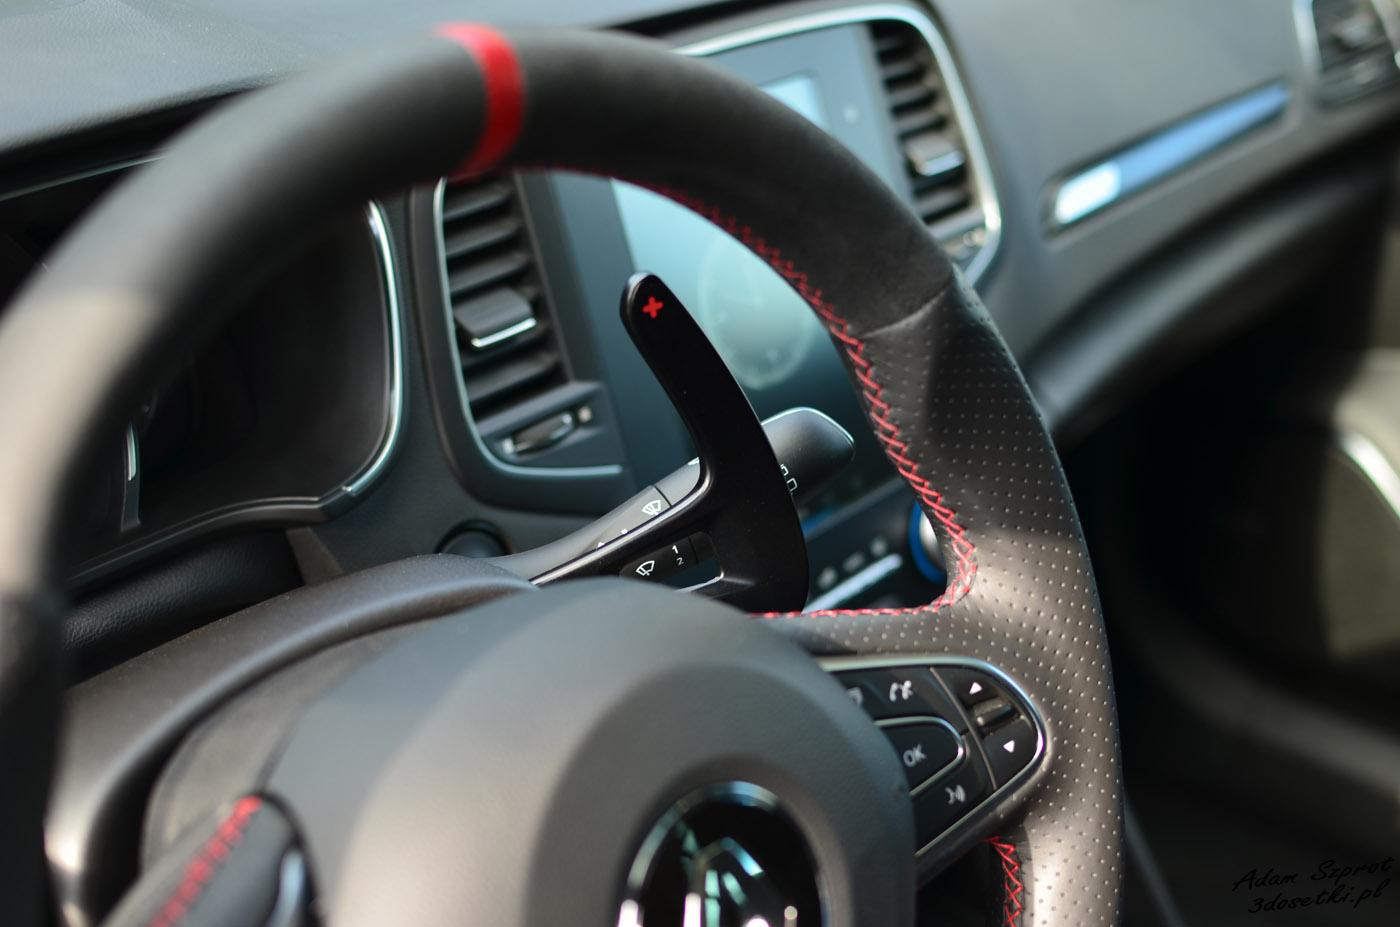 Łopatki w Renault Megane RS